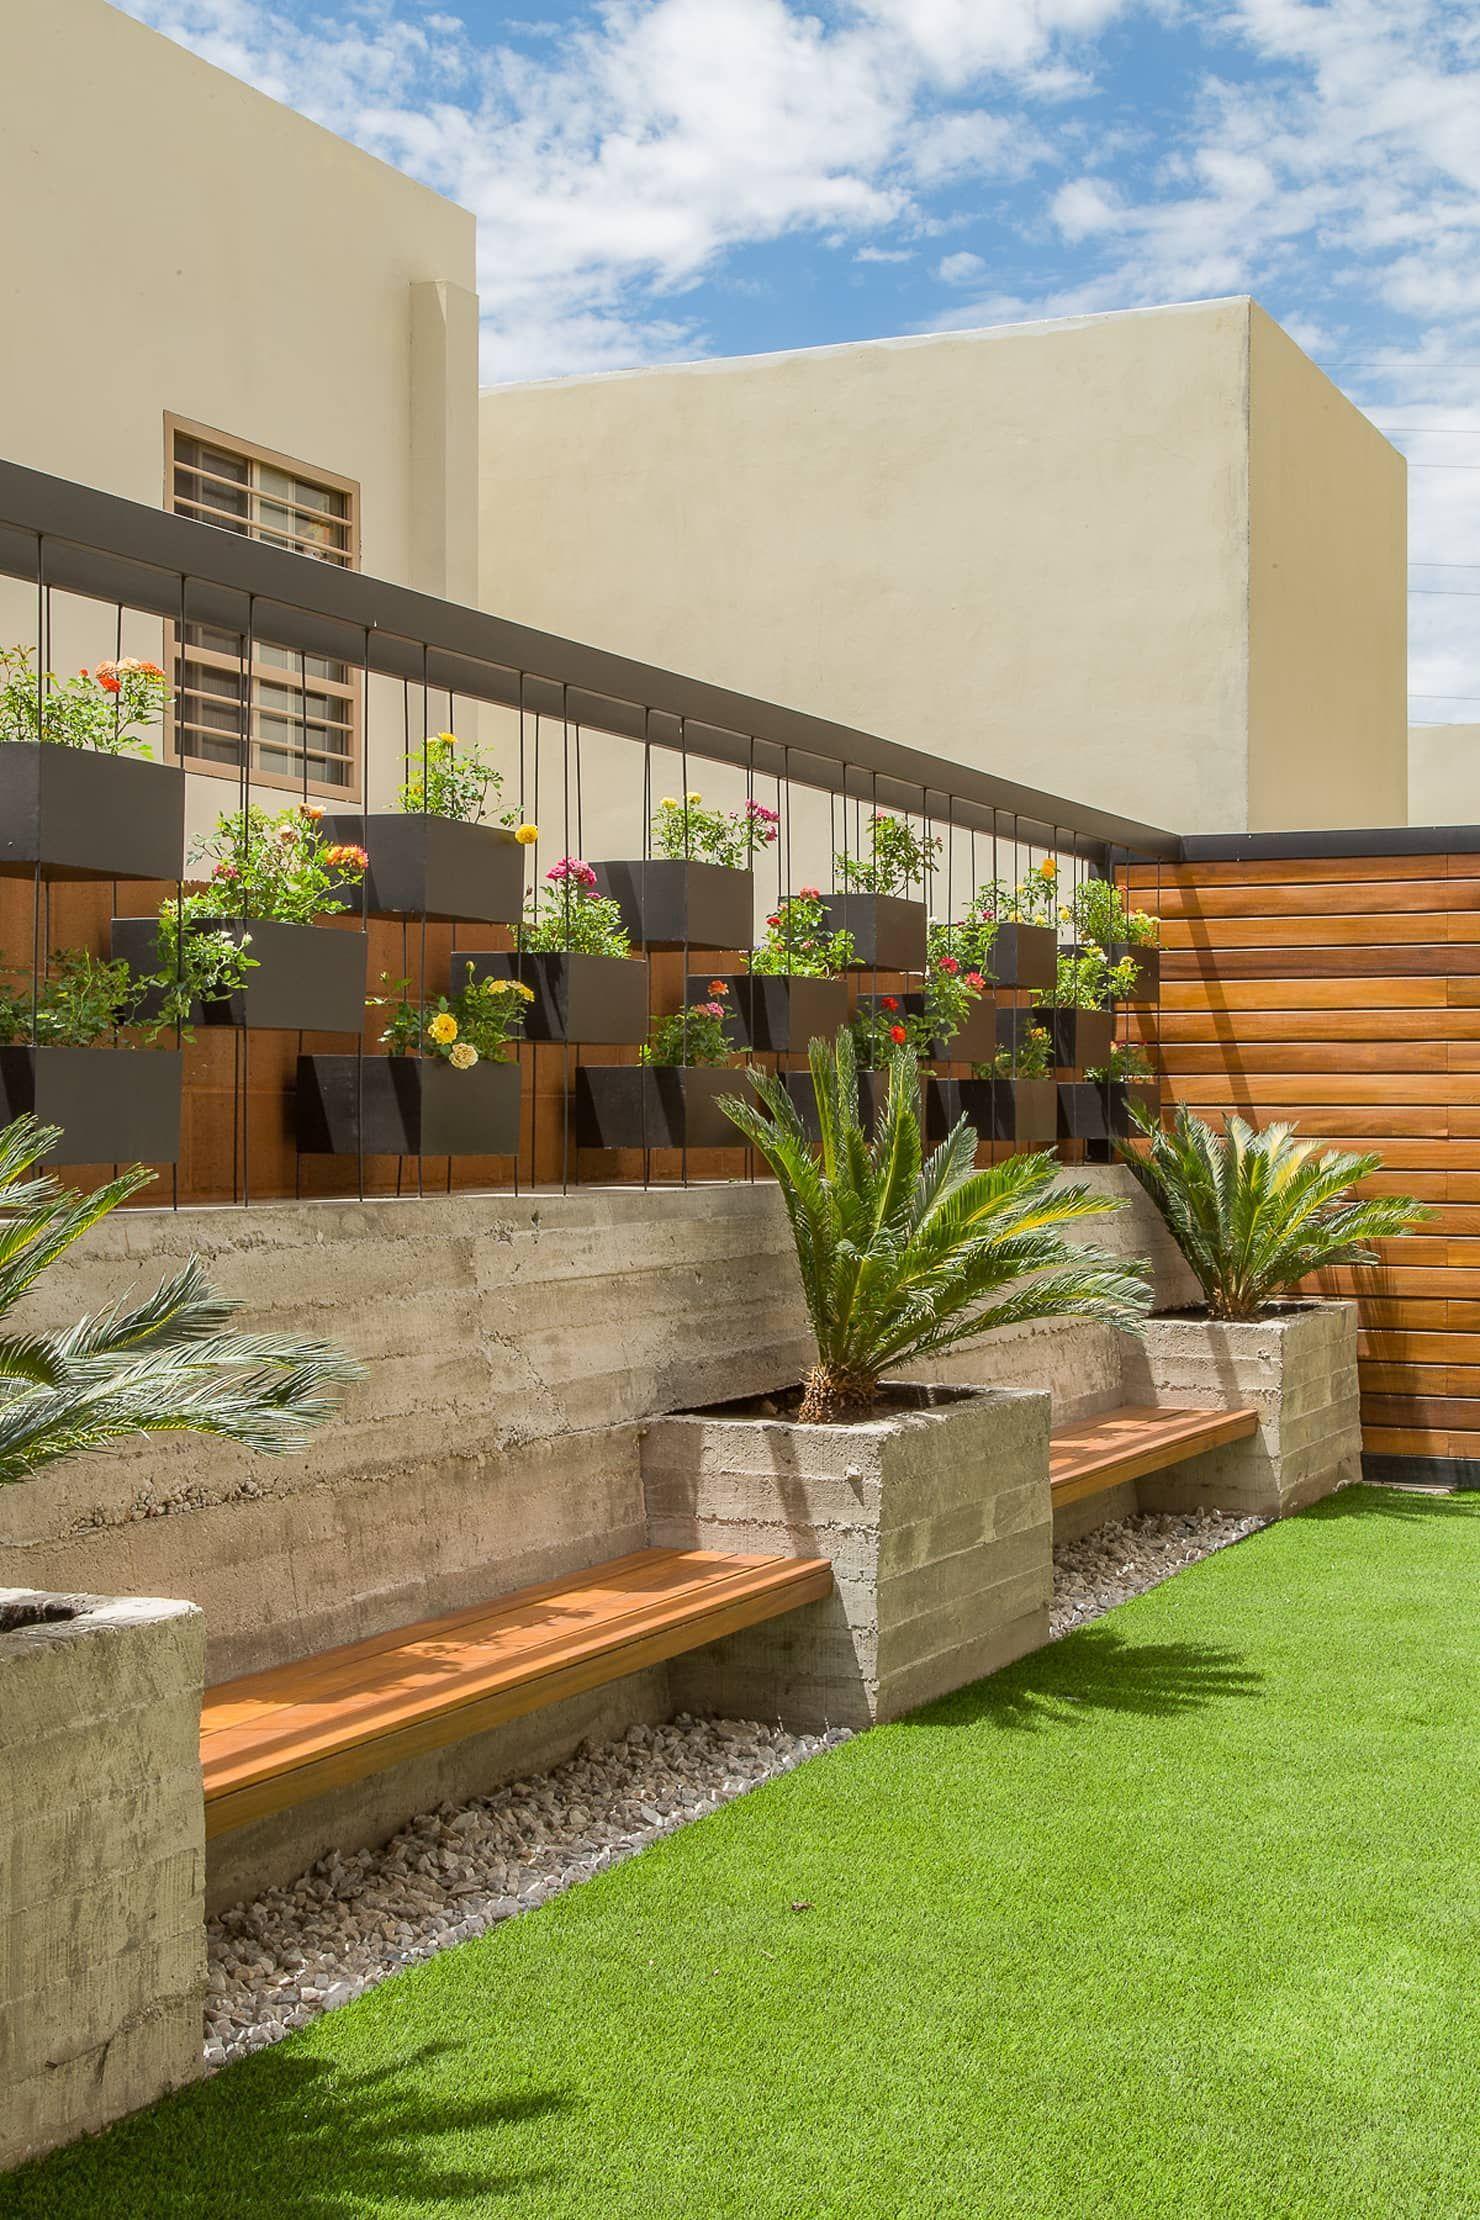 Area Exterior Caf Jardines Minimalistas De S2 Arquitectos Minimalista Homify In 2020 Backyard Landscaping Designs Outdoor Gardens Design Small Backyard Landscaping